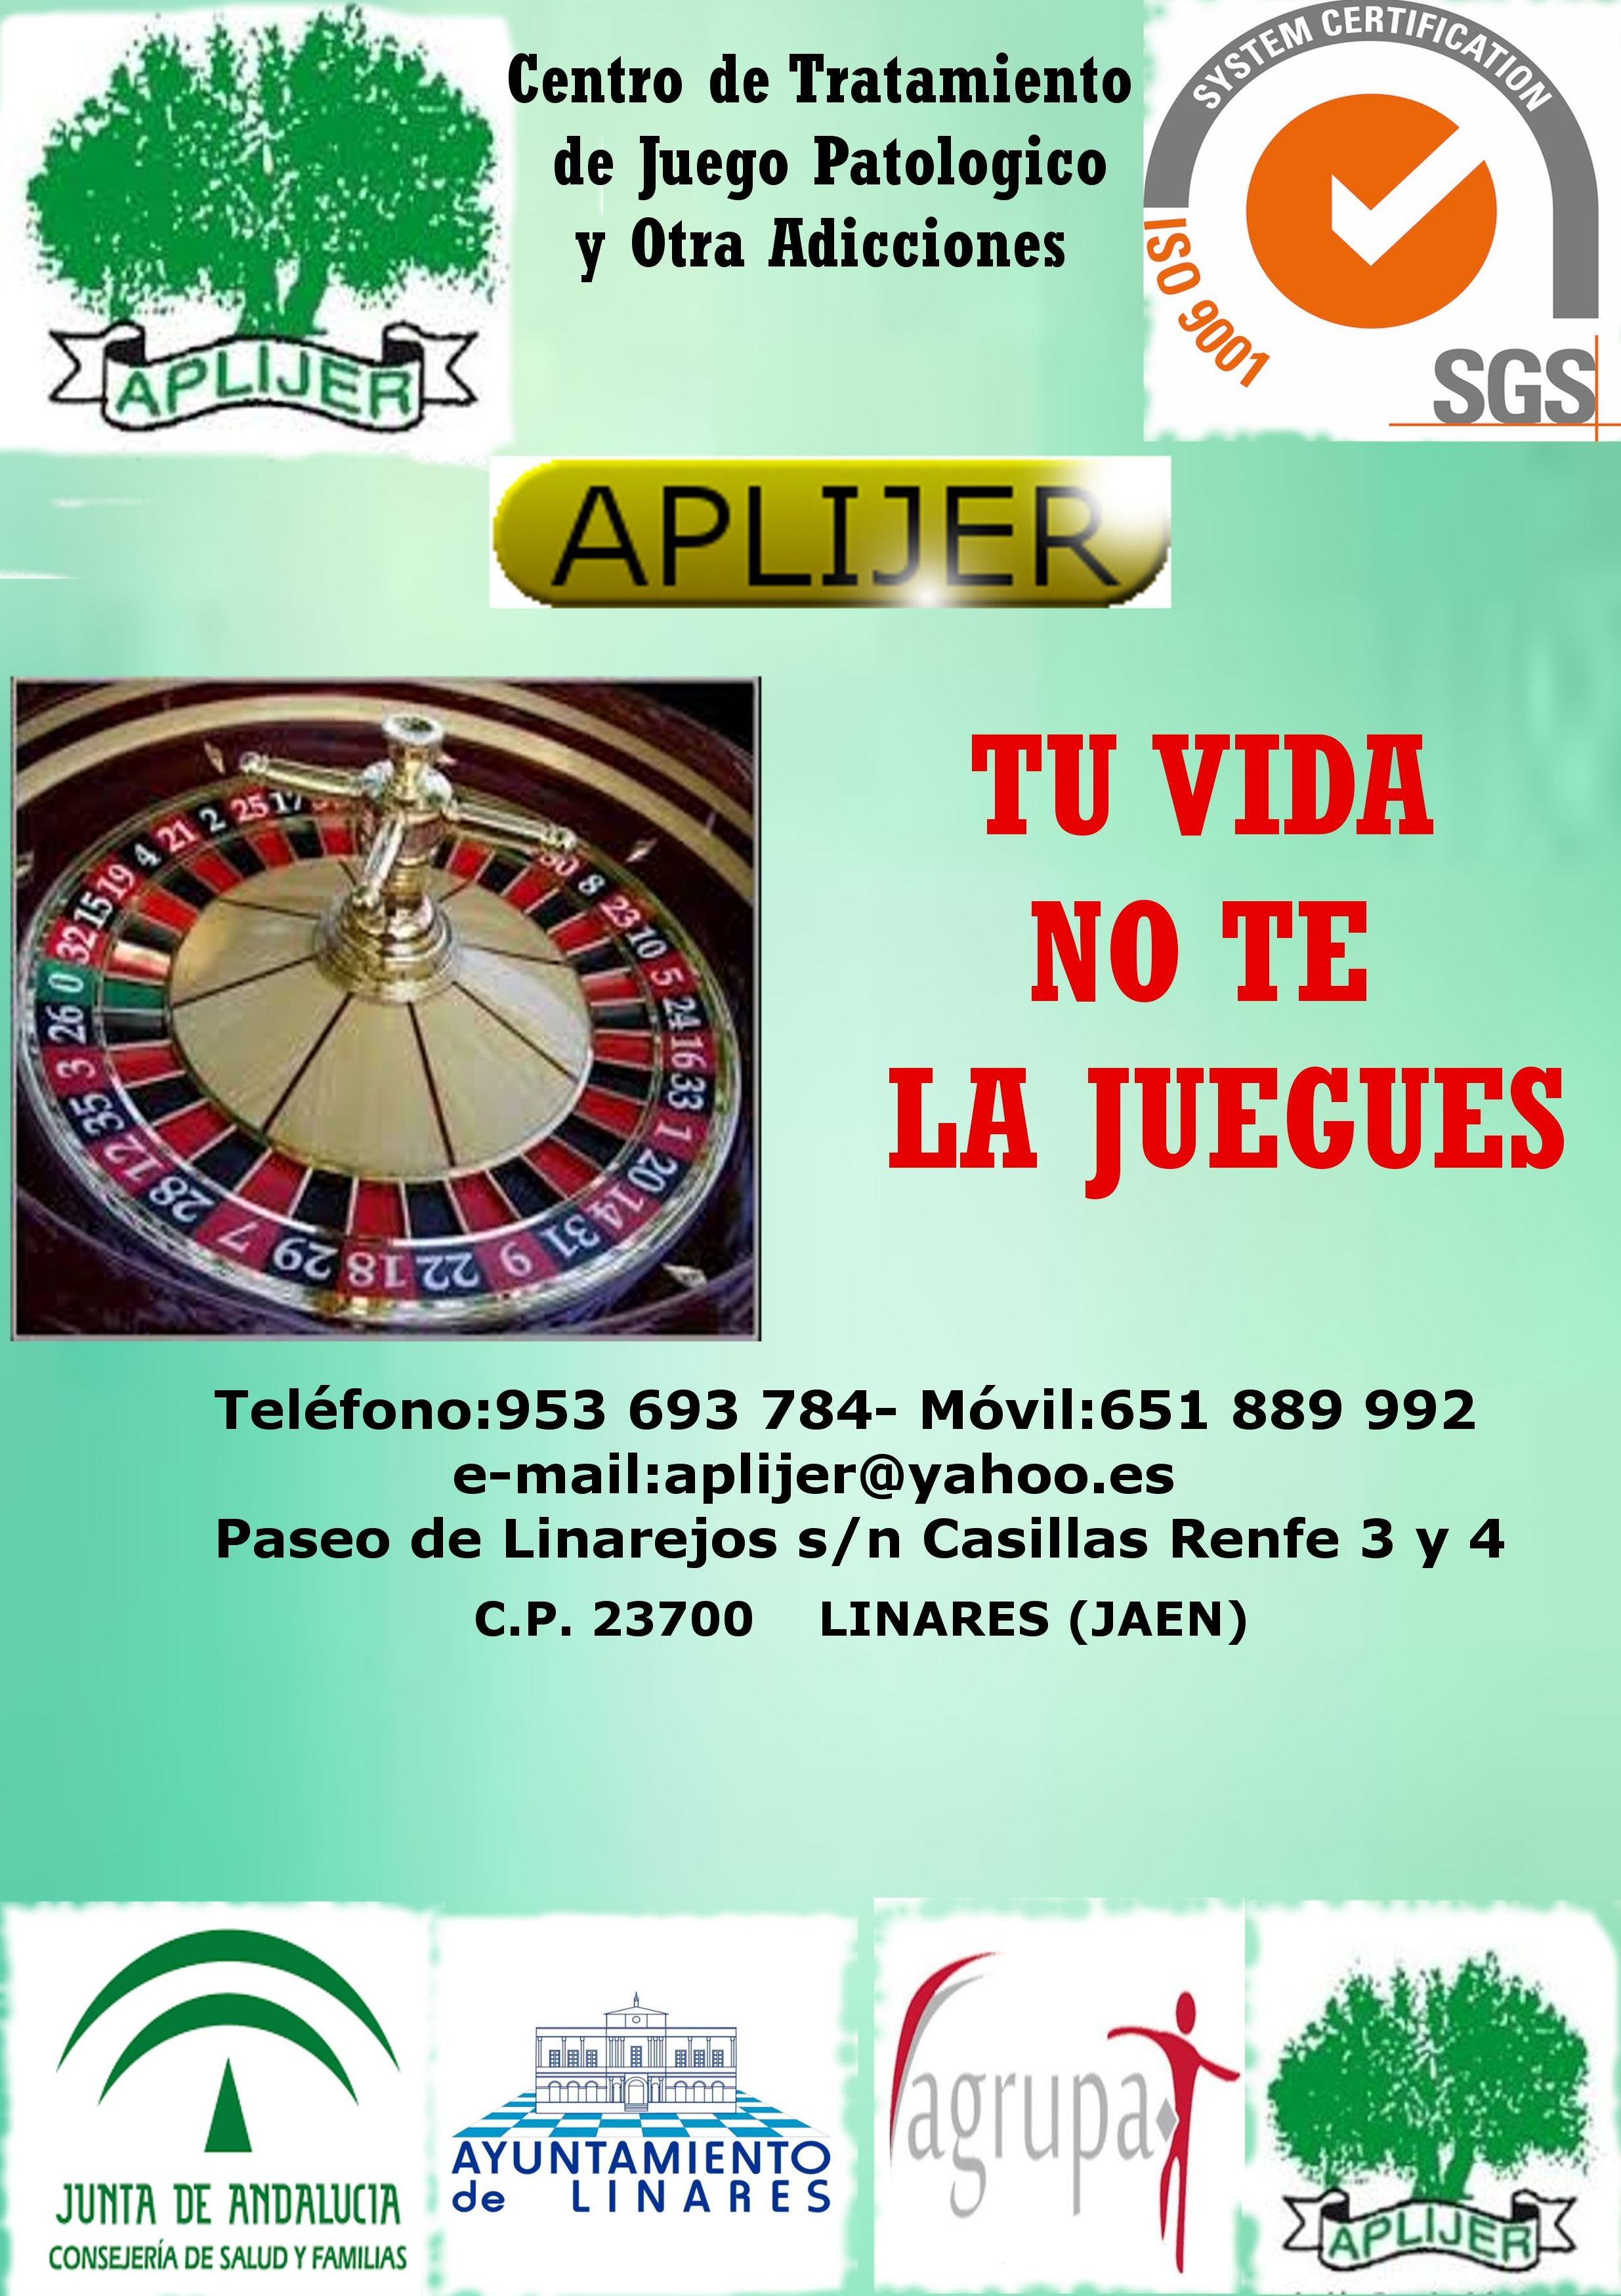 Picture 3 of Asociaciones de ayuda in Linares | A.P.L.I.J.E.R